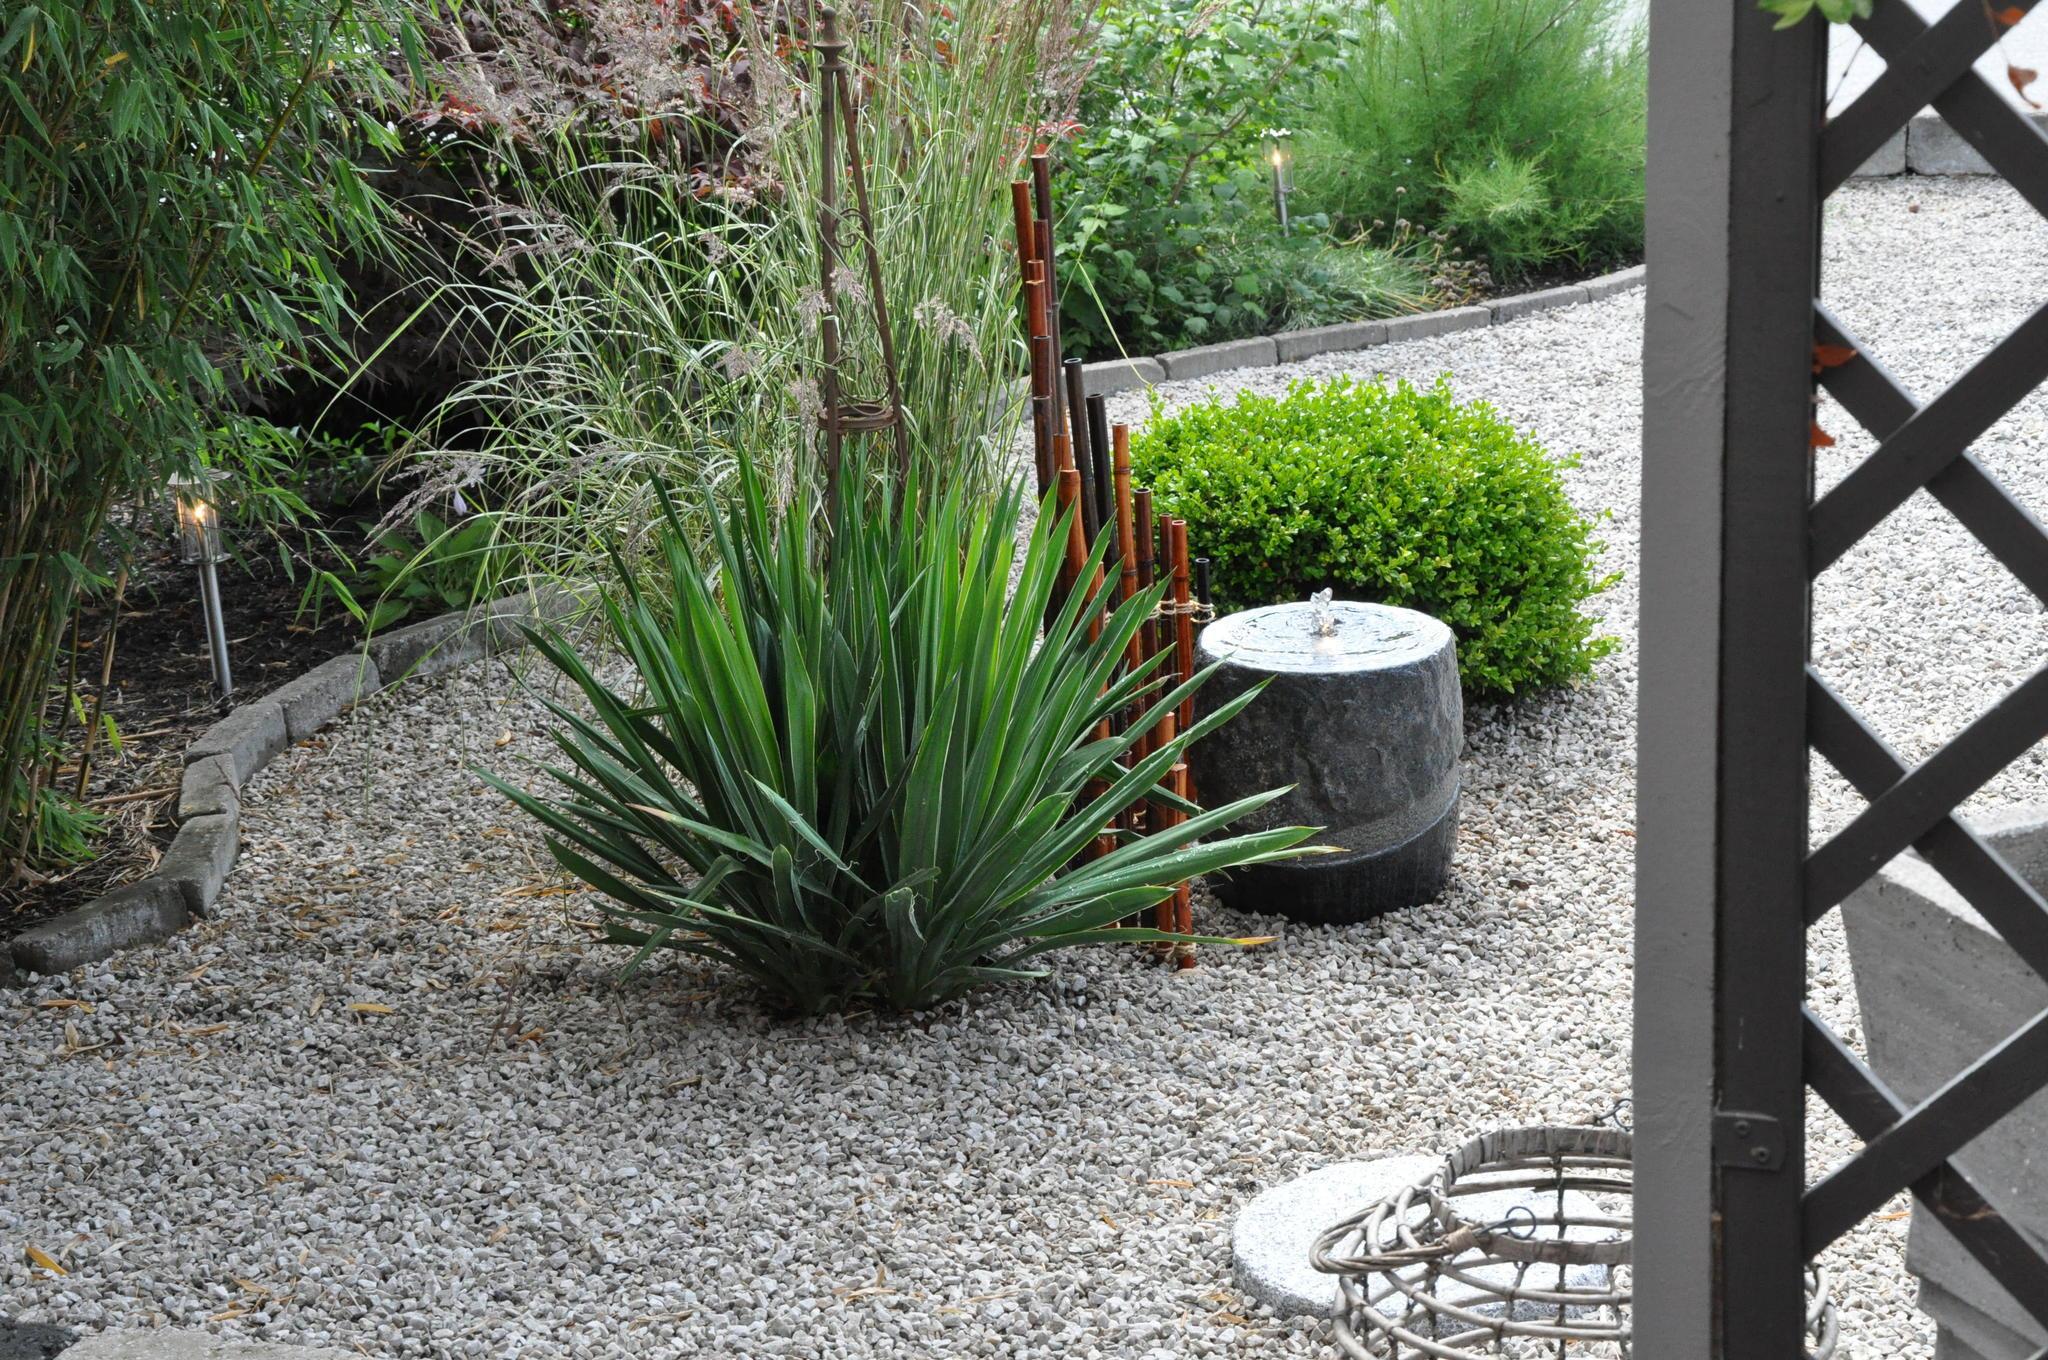 Feng shui i trädgården   nordsjö idé & design